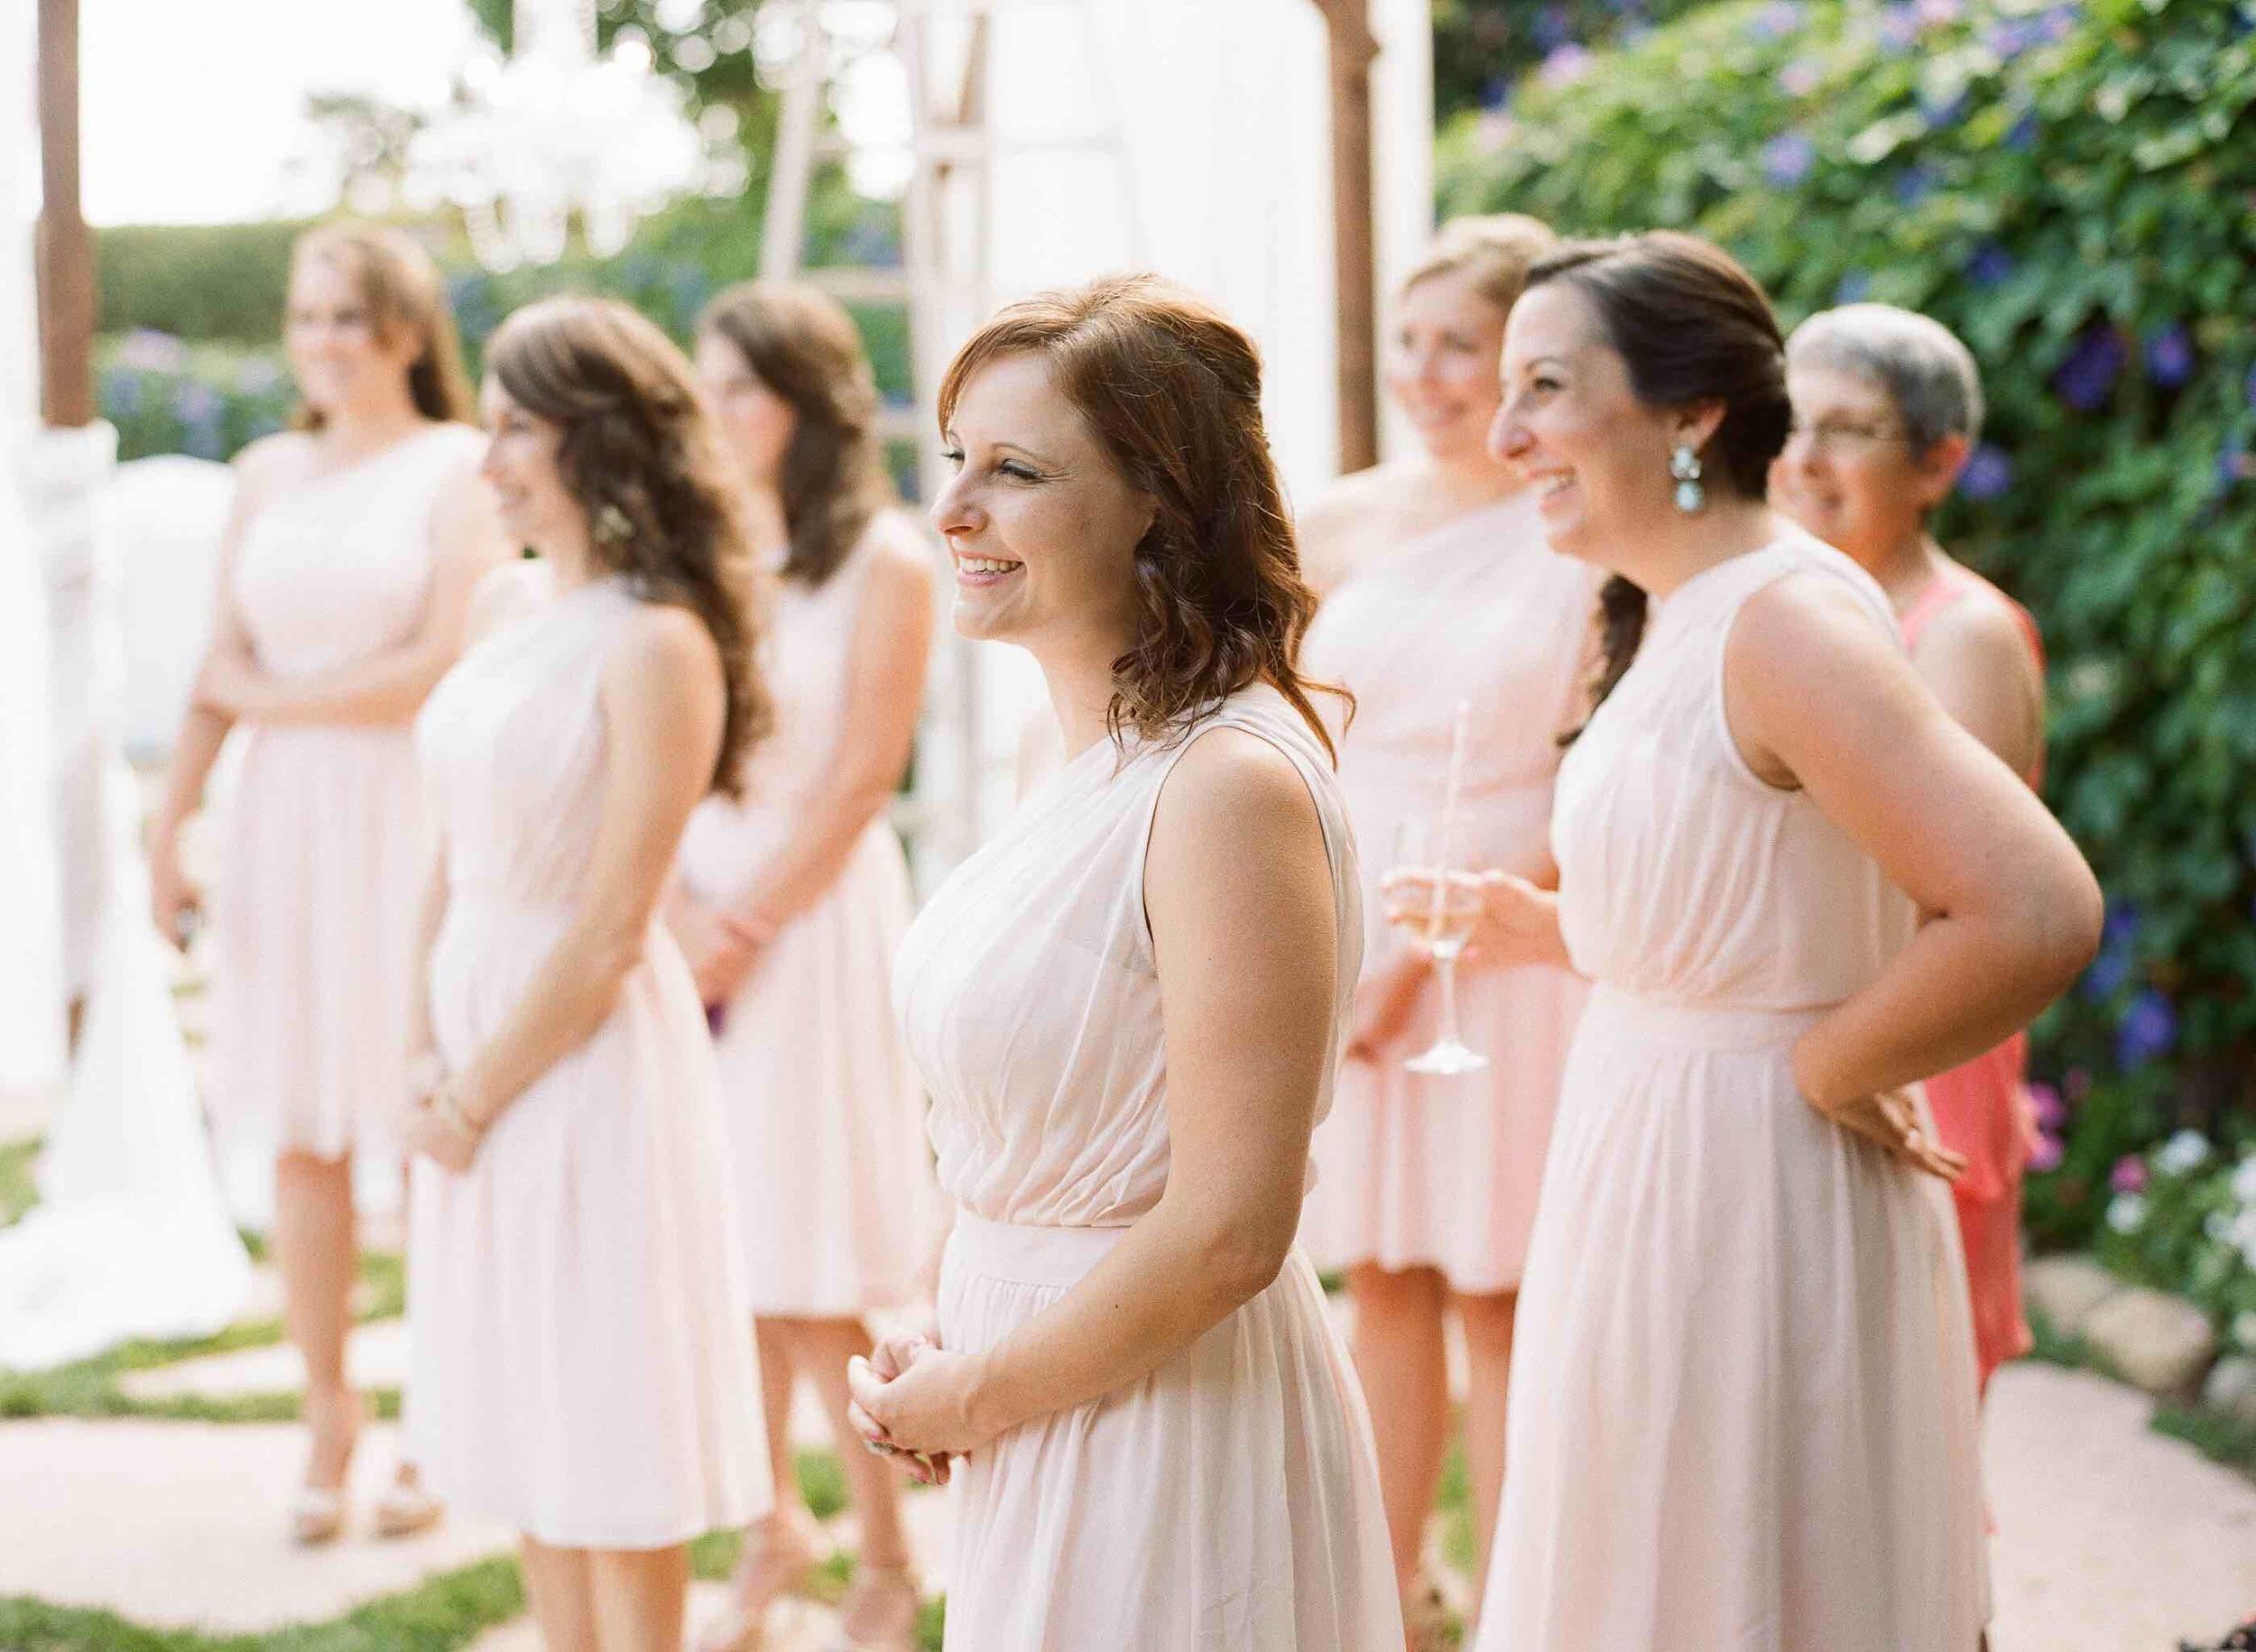 bridal party 5.jpg